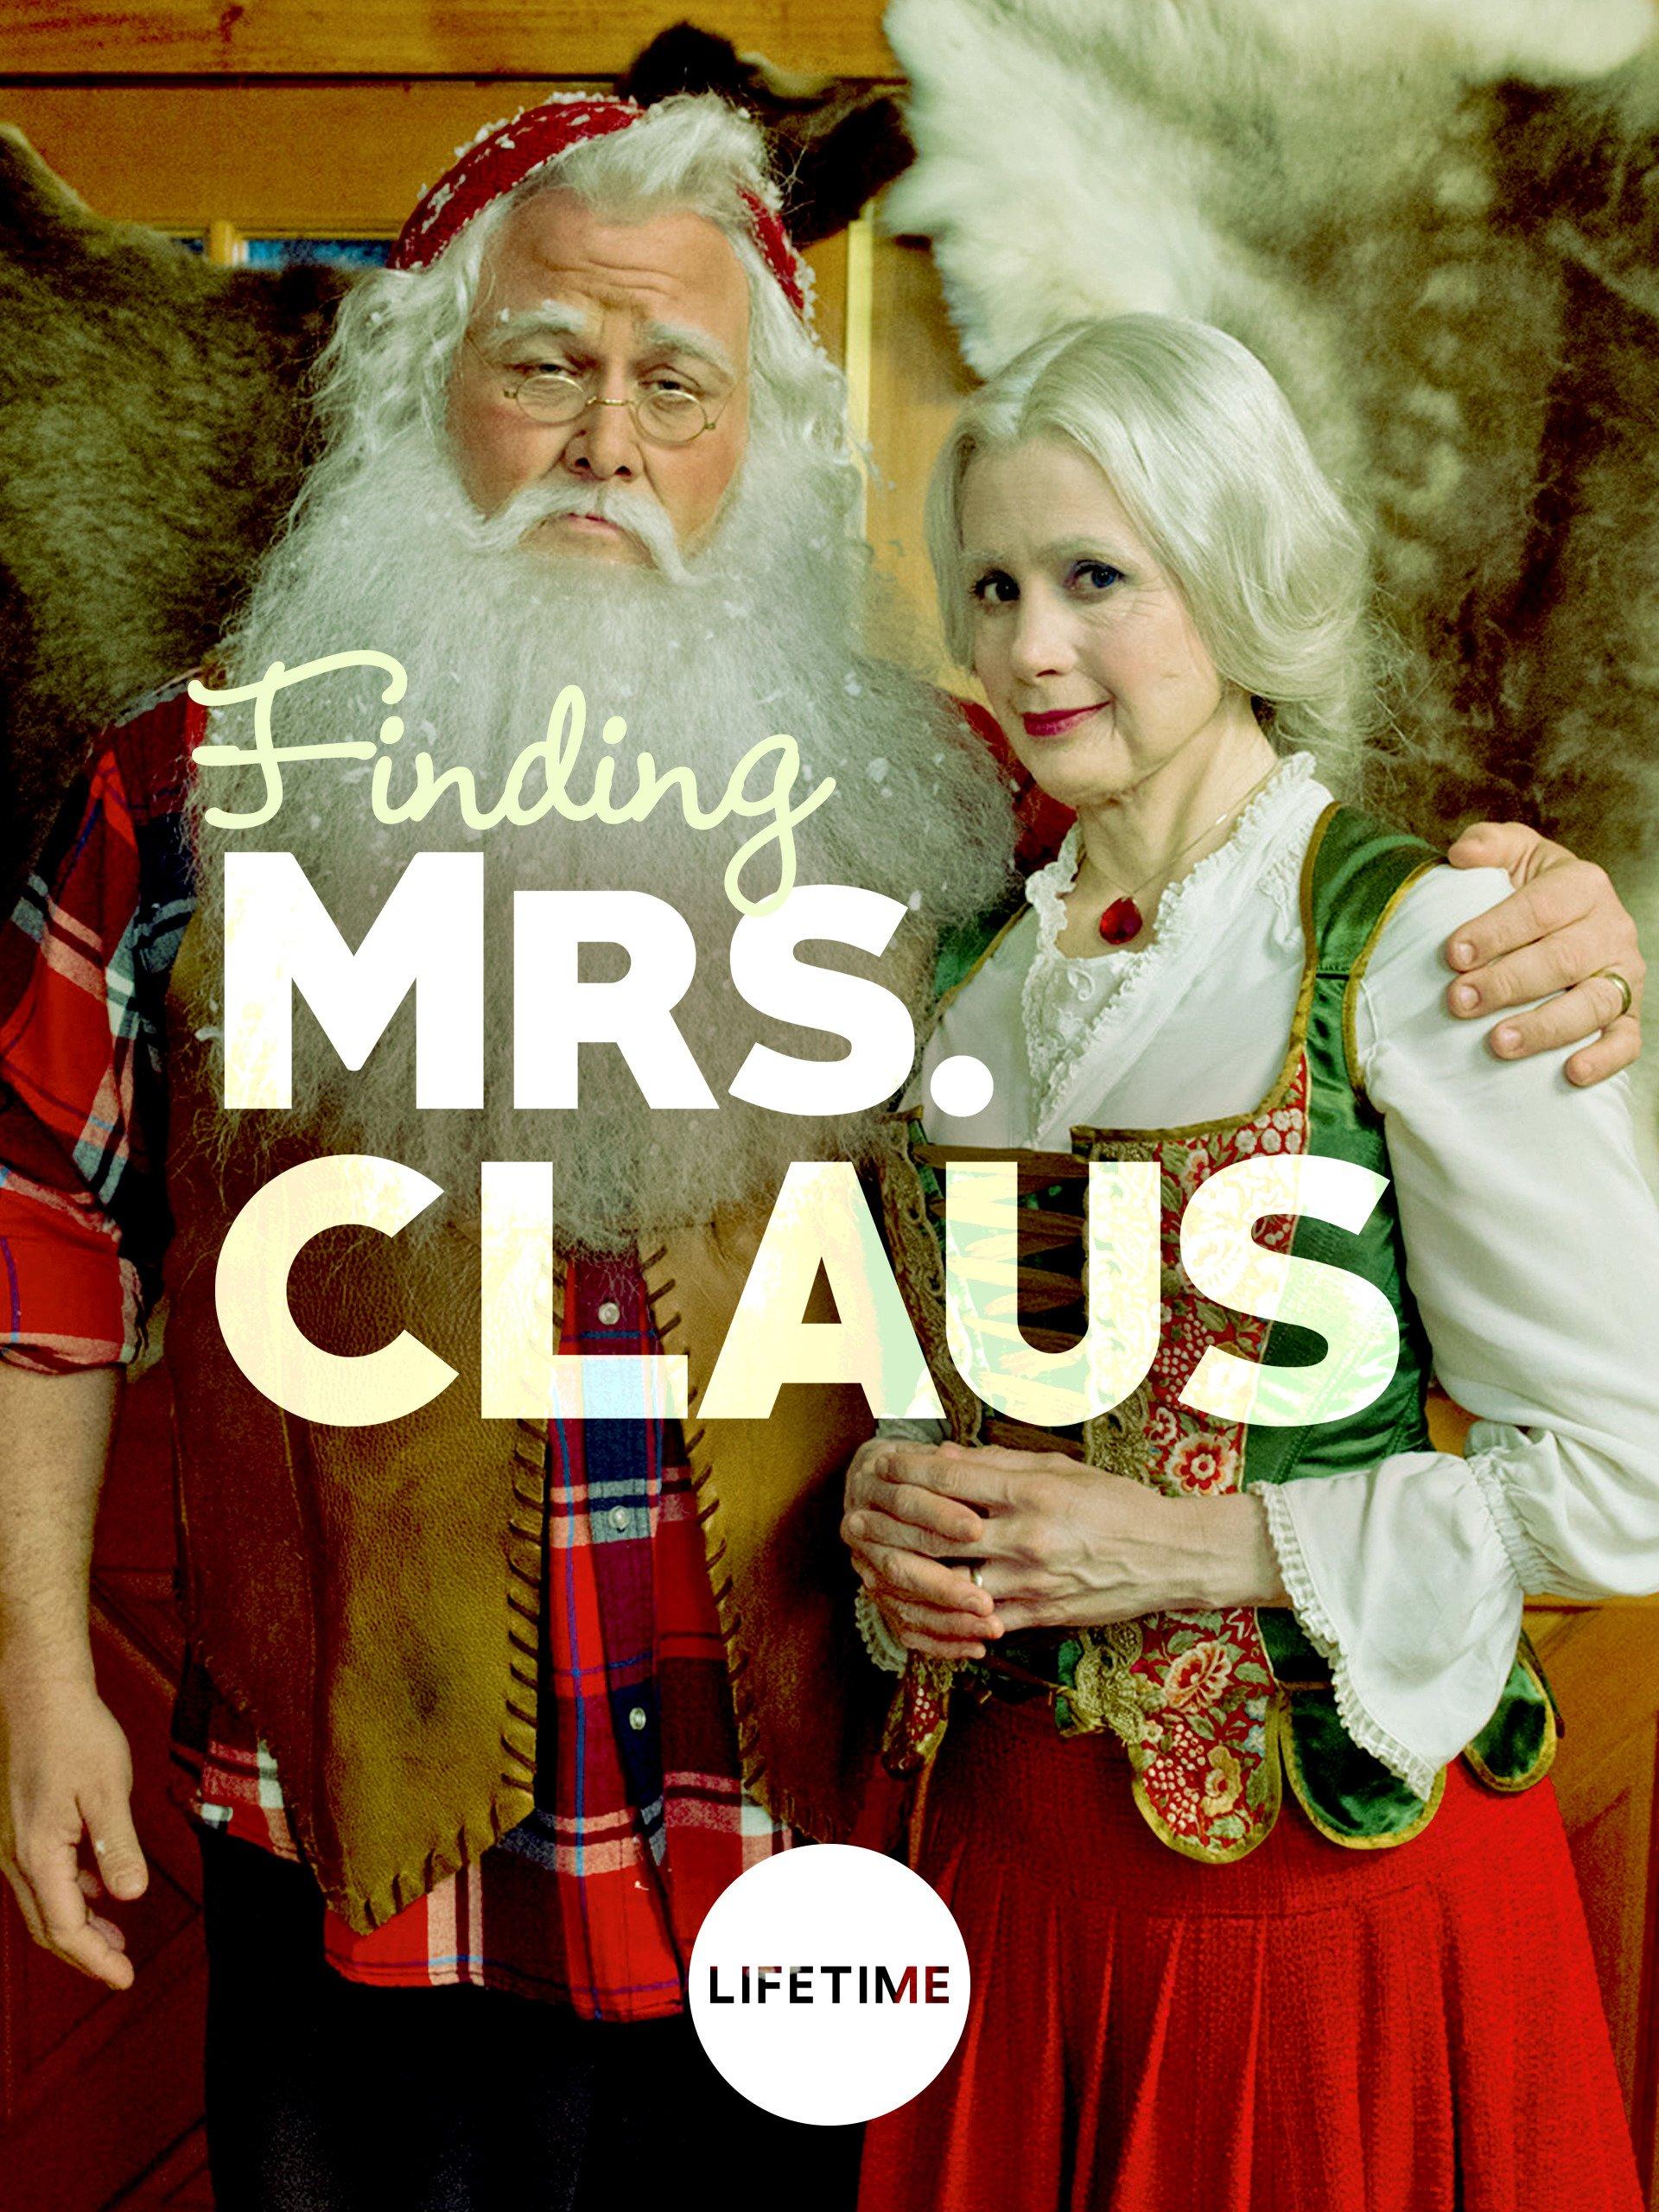 Amazon.com: Finding Mrs. Claus: Foxfield Entertainment: Amazon ...